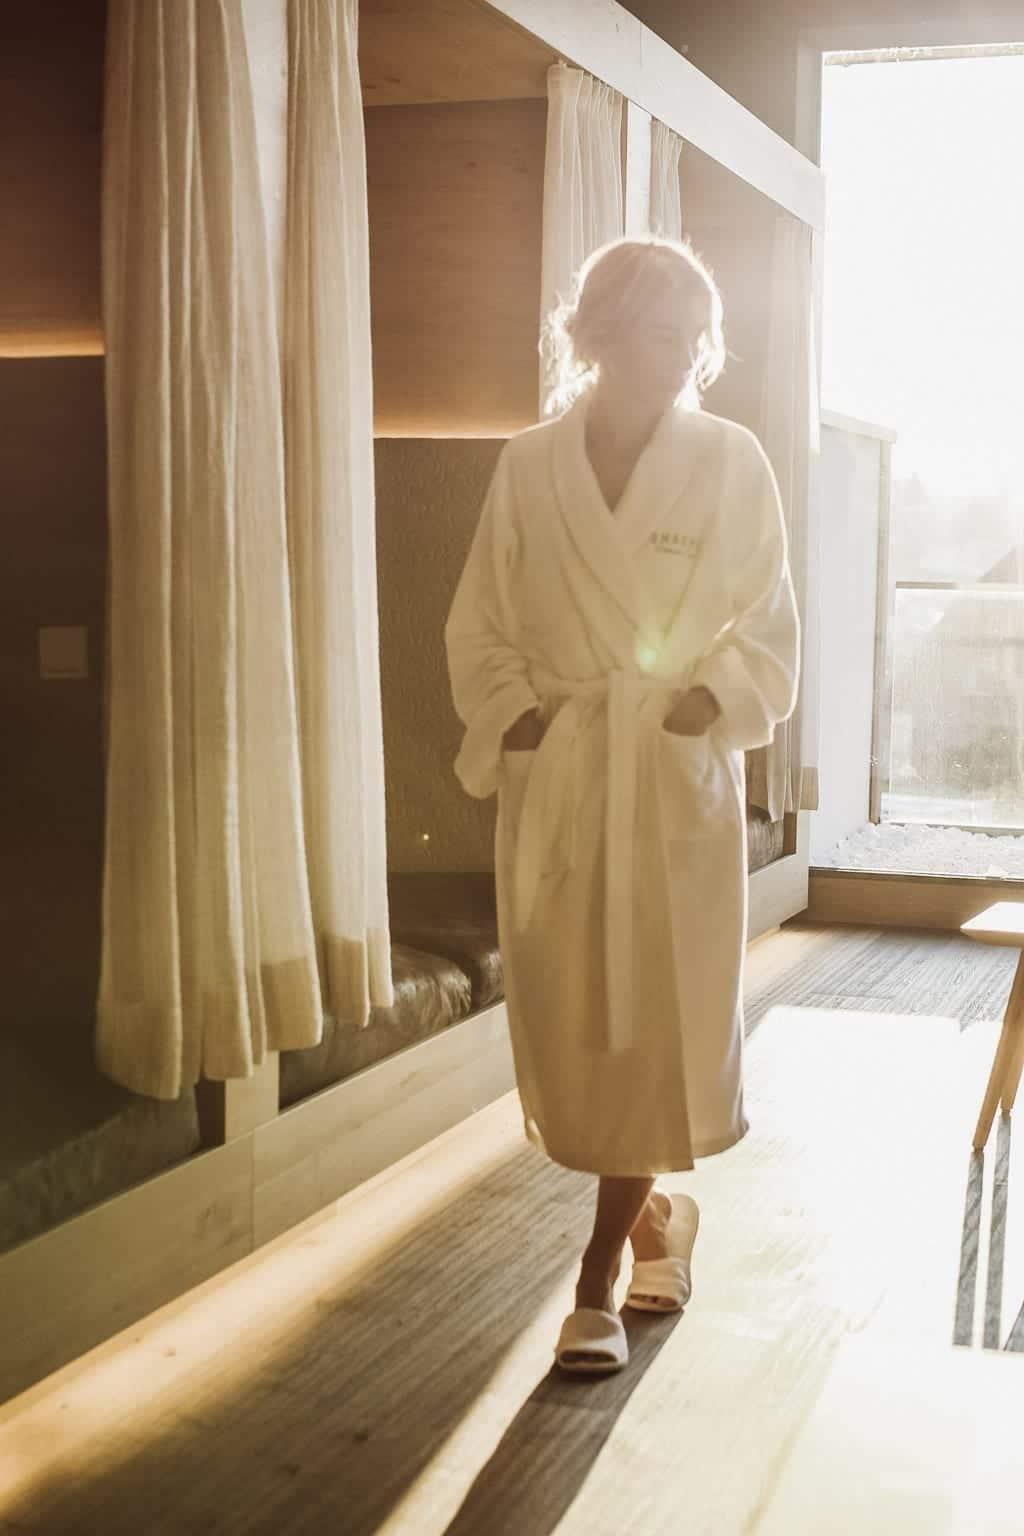 ck-constantlyk-com-karin-kaswurm-wellness-spa-hotel-gmachl-salzburg-3694